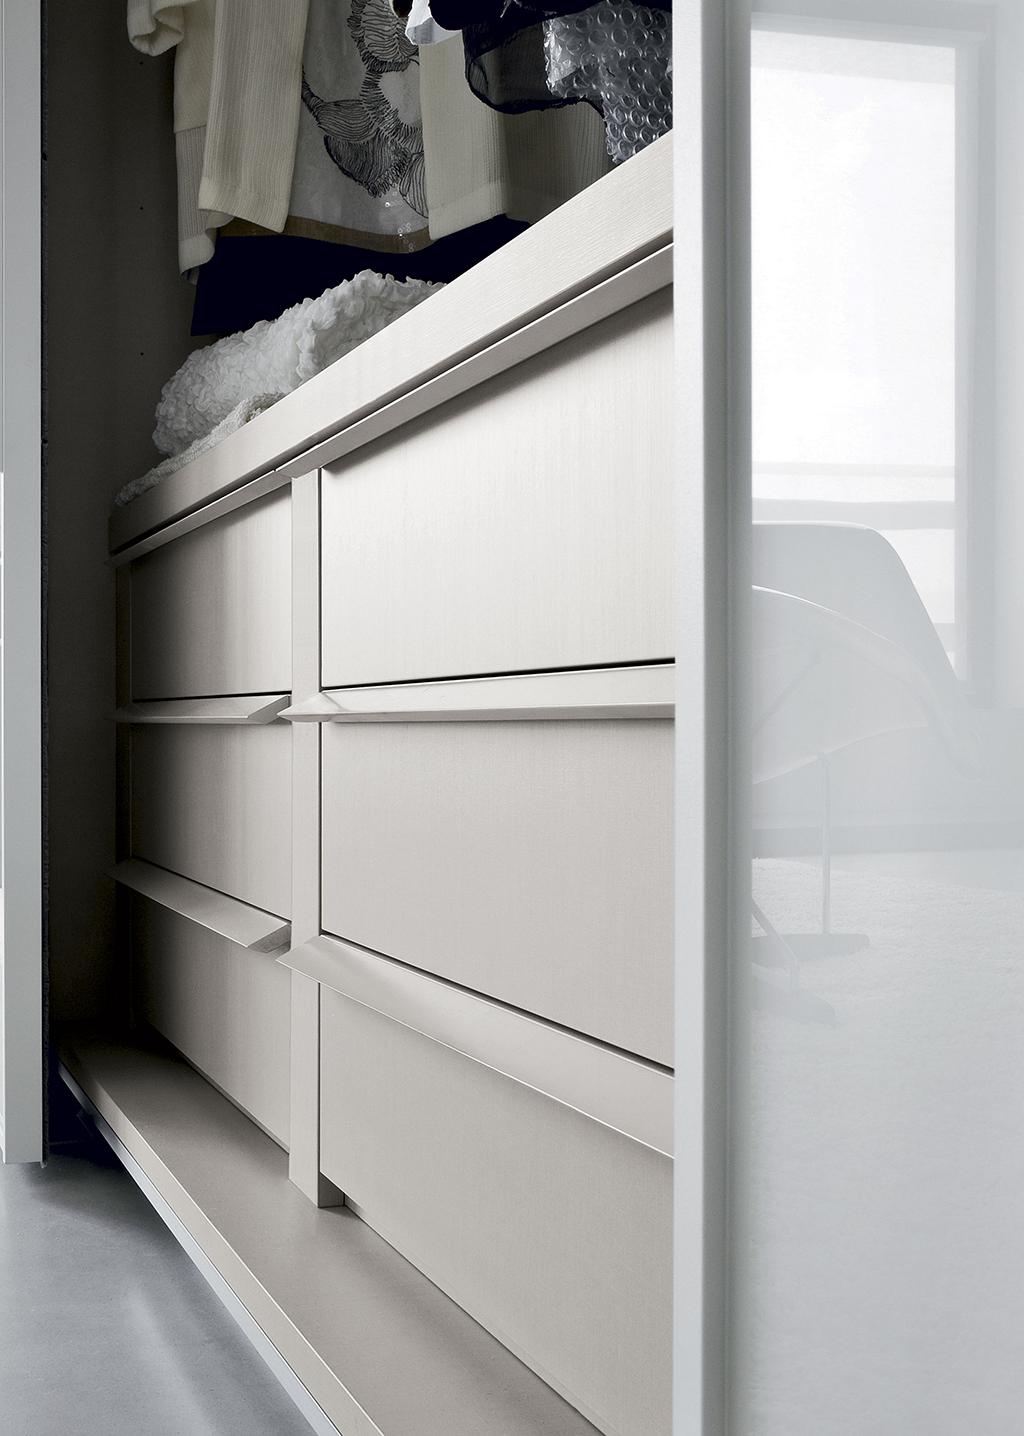 amore 056 fitted bedroom furniture wardrobes uk lawrence walsh furniture. Black Bedroom Furniture Sets. Home Design Ideas